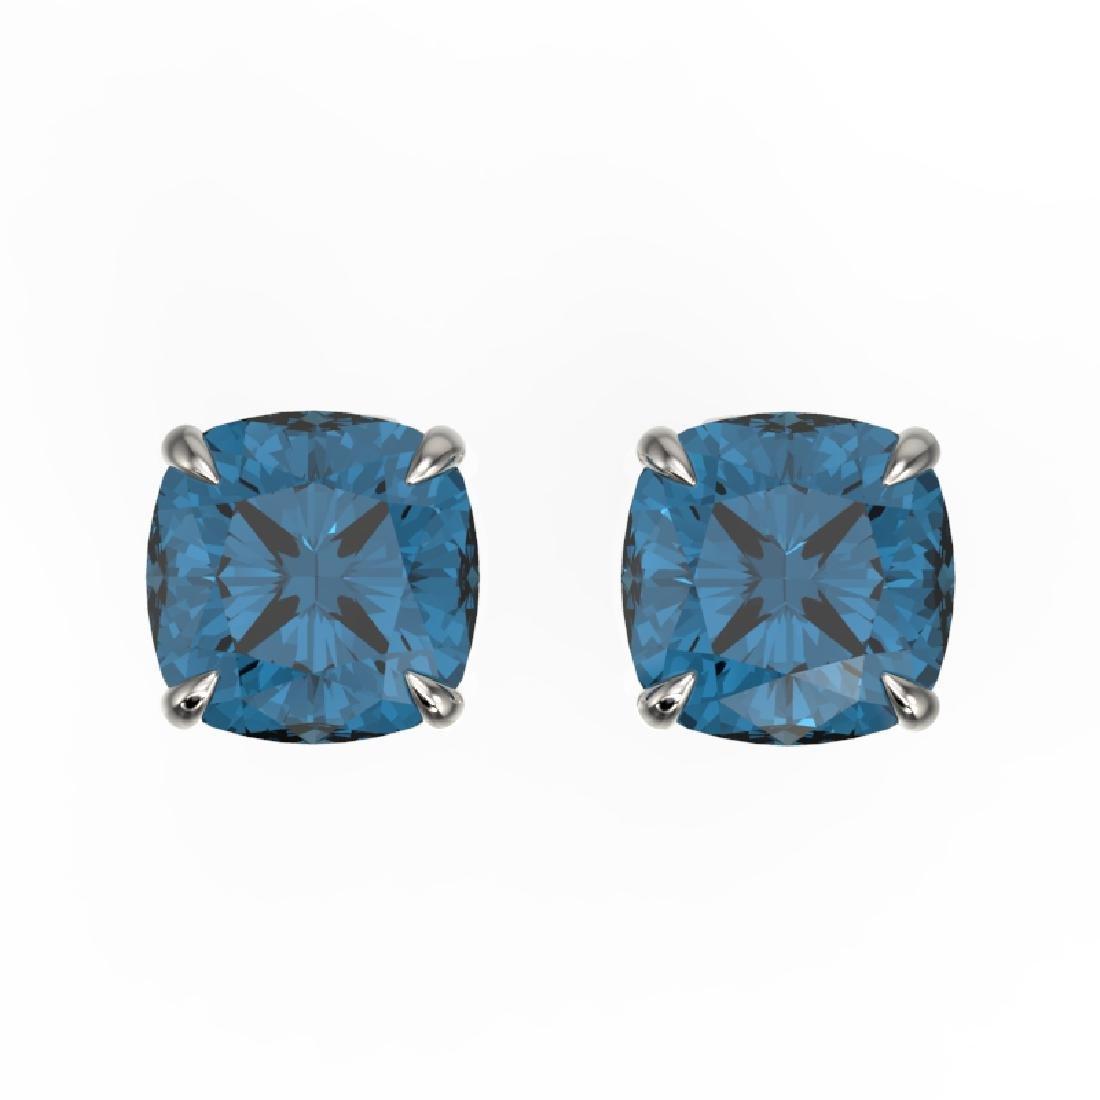 3 CTW Cushion Cut London Blue Topaz Designer Stud